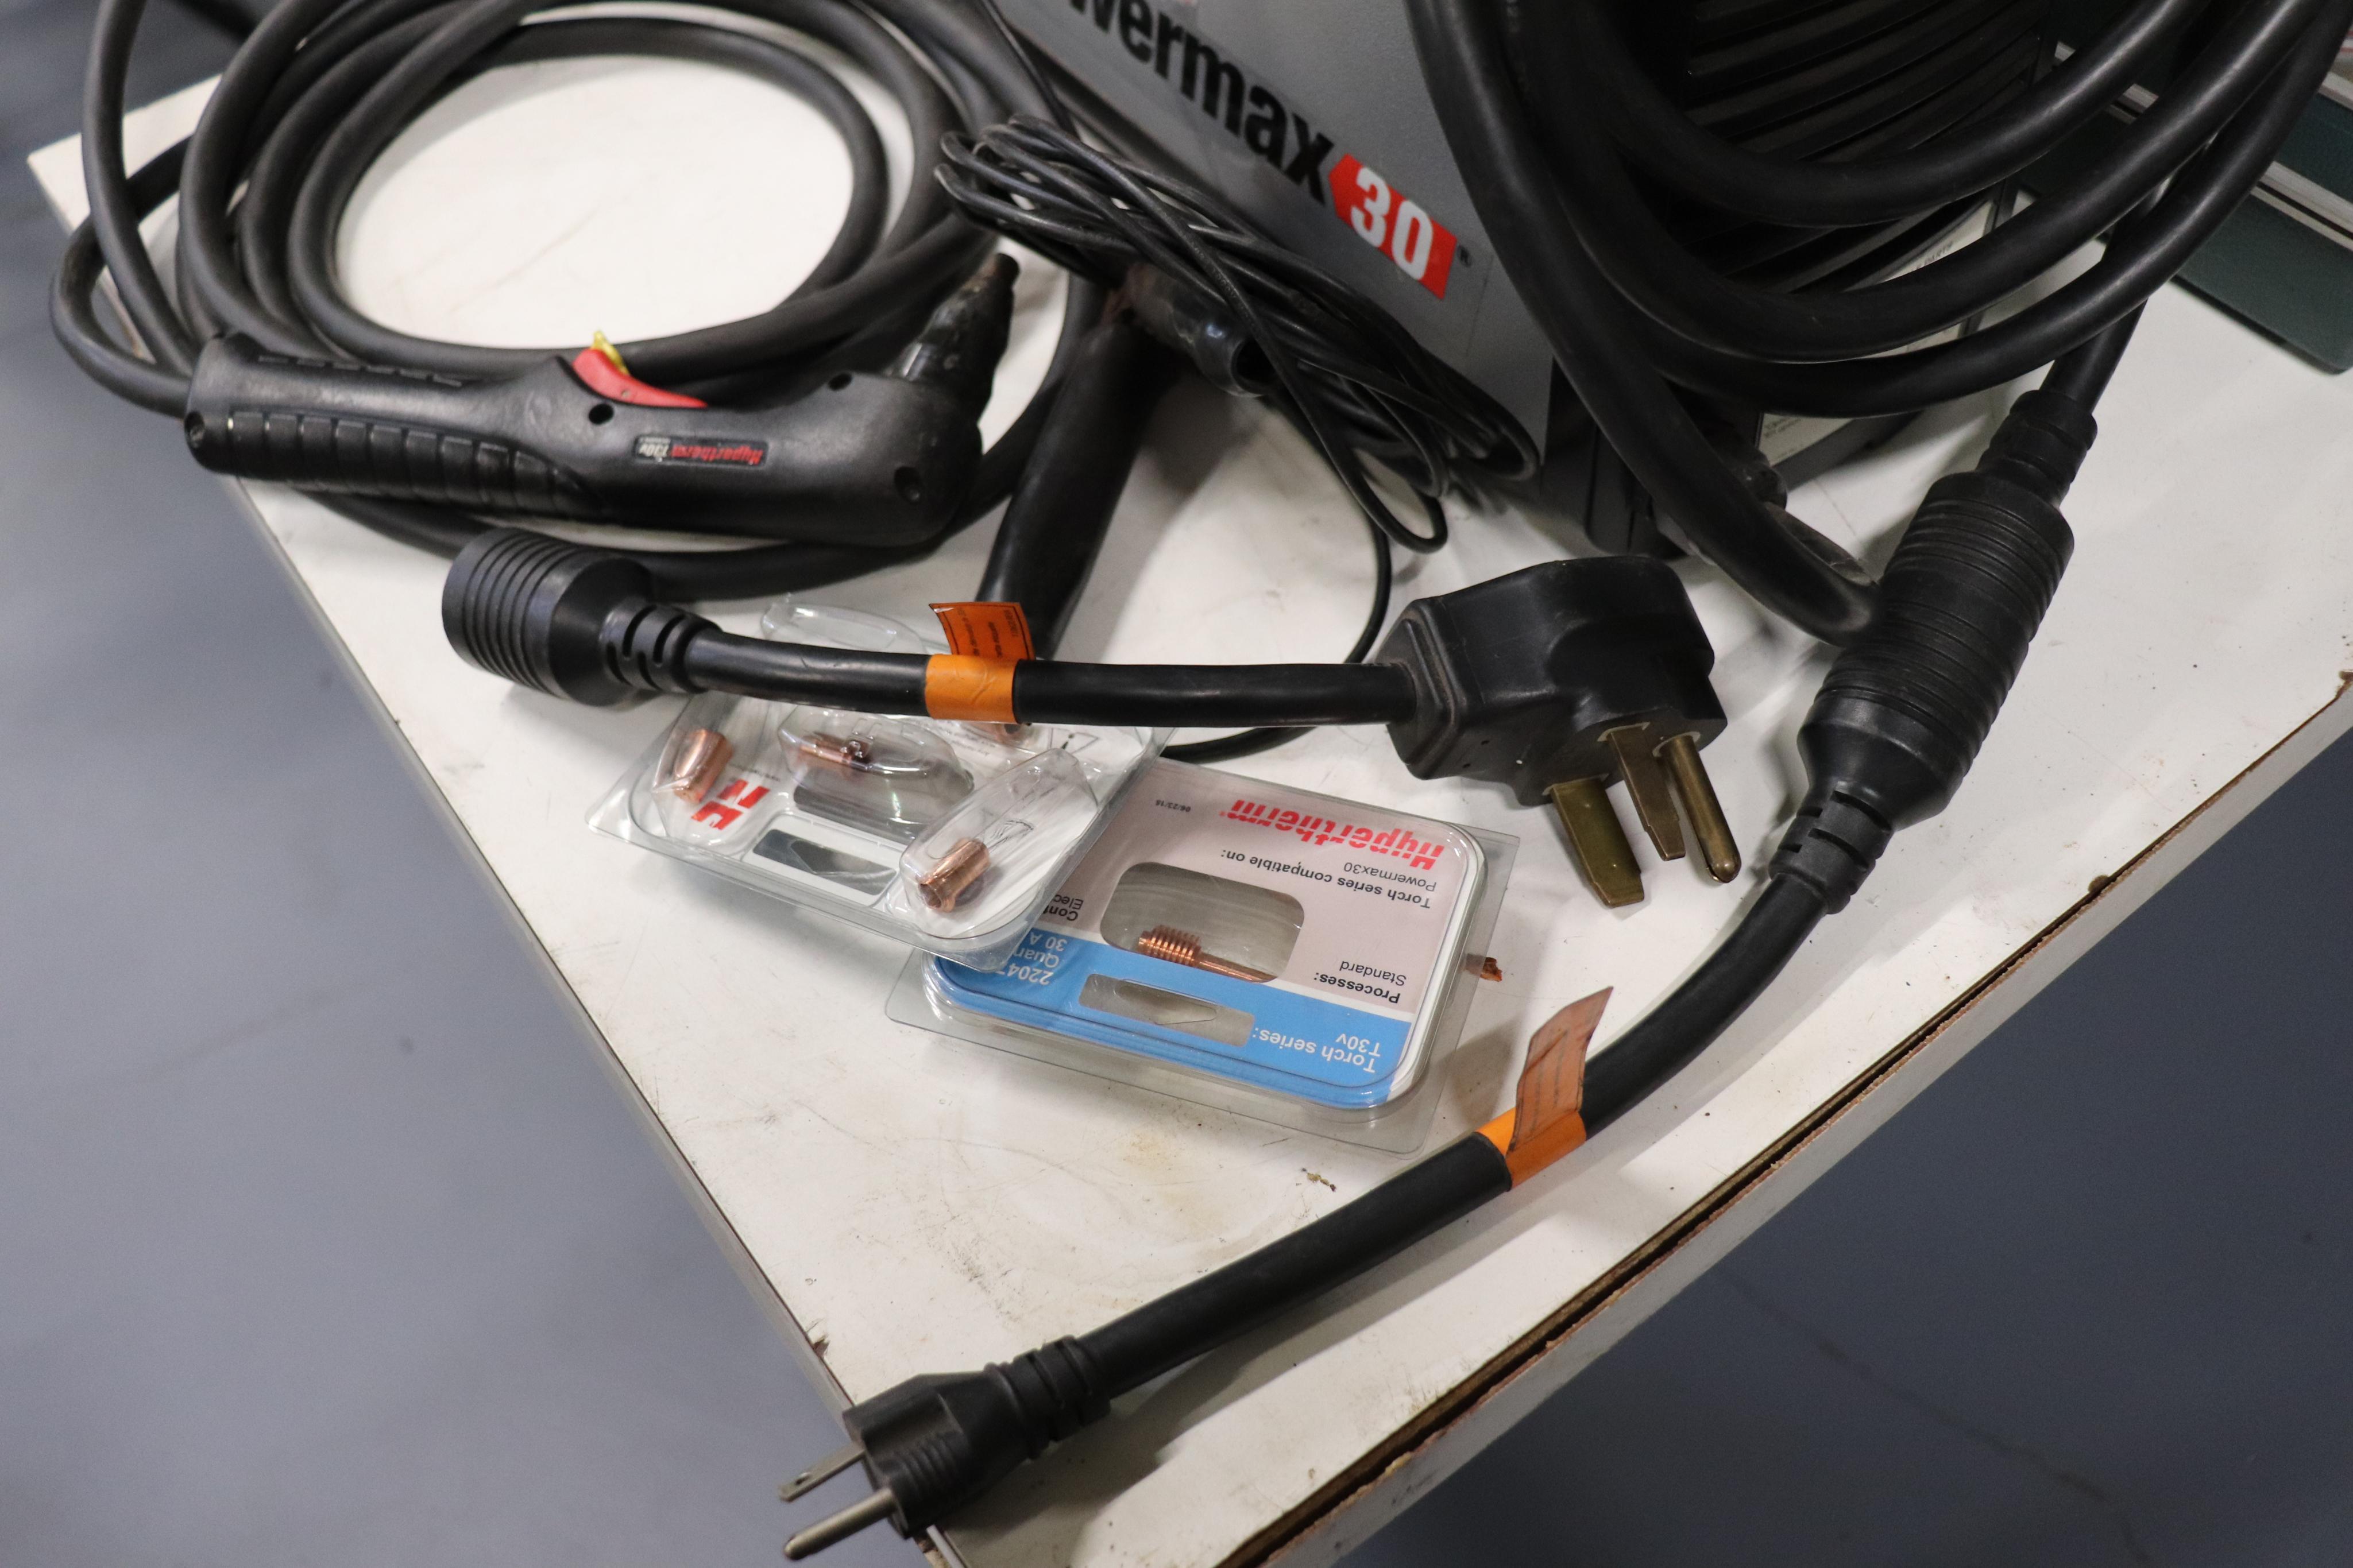 Hypertherm Powermax 30 plasma cutter - Image 4 of 4